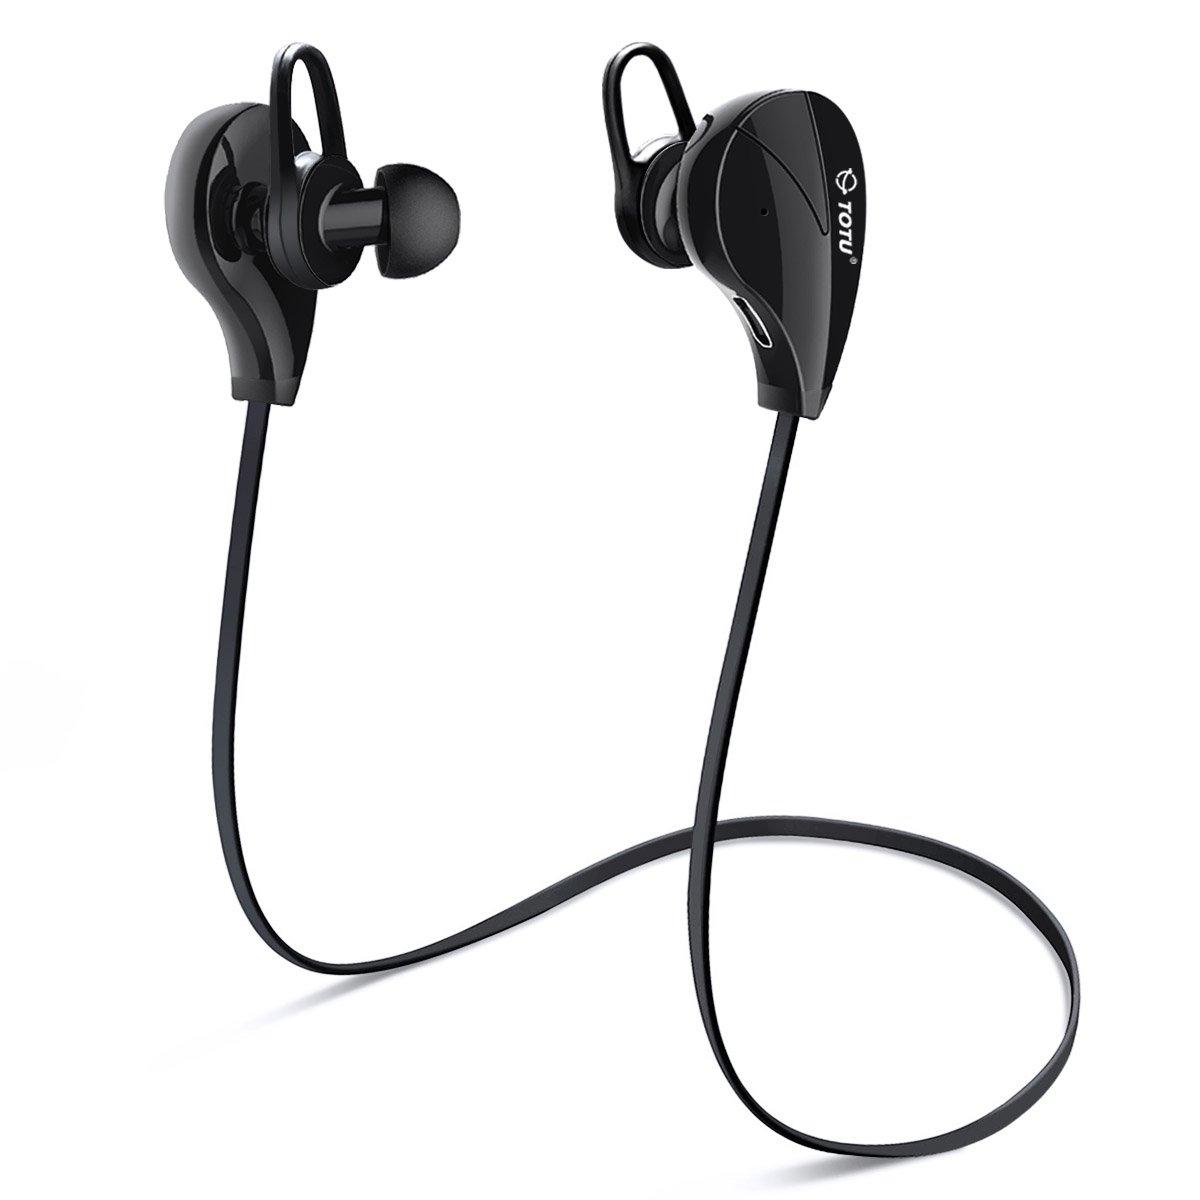 bluetooth headphones totu v4 1 stereo noise isolating sports sweatproof head. Black Bedroom Furniture Sets. Home Design Ideas